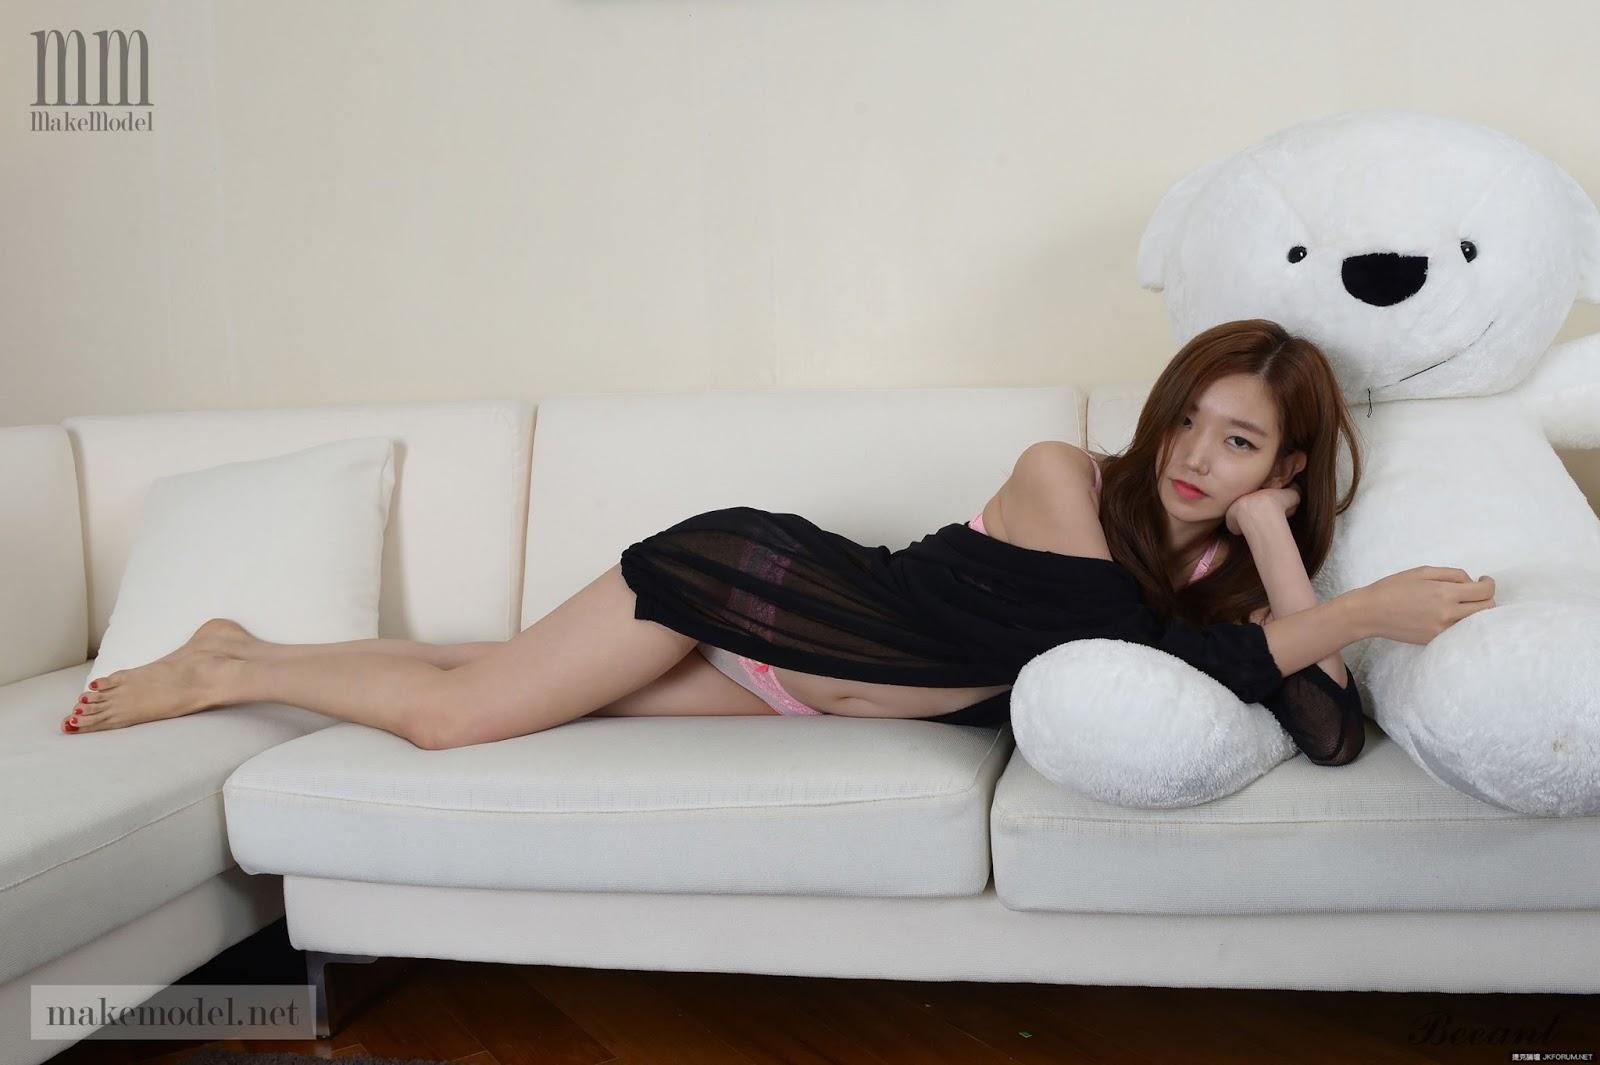 Dayeong%2BPretty%2B%25E9%259F%2593%25E5%259C%258B%2BKorean%2BTeen%2BNaked%2B%2526%2BUncensored 270912 2 - Korean Nude - Big Albom Remain #A-korean girl